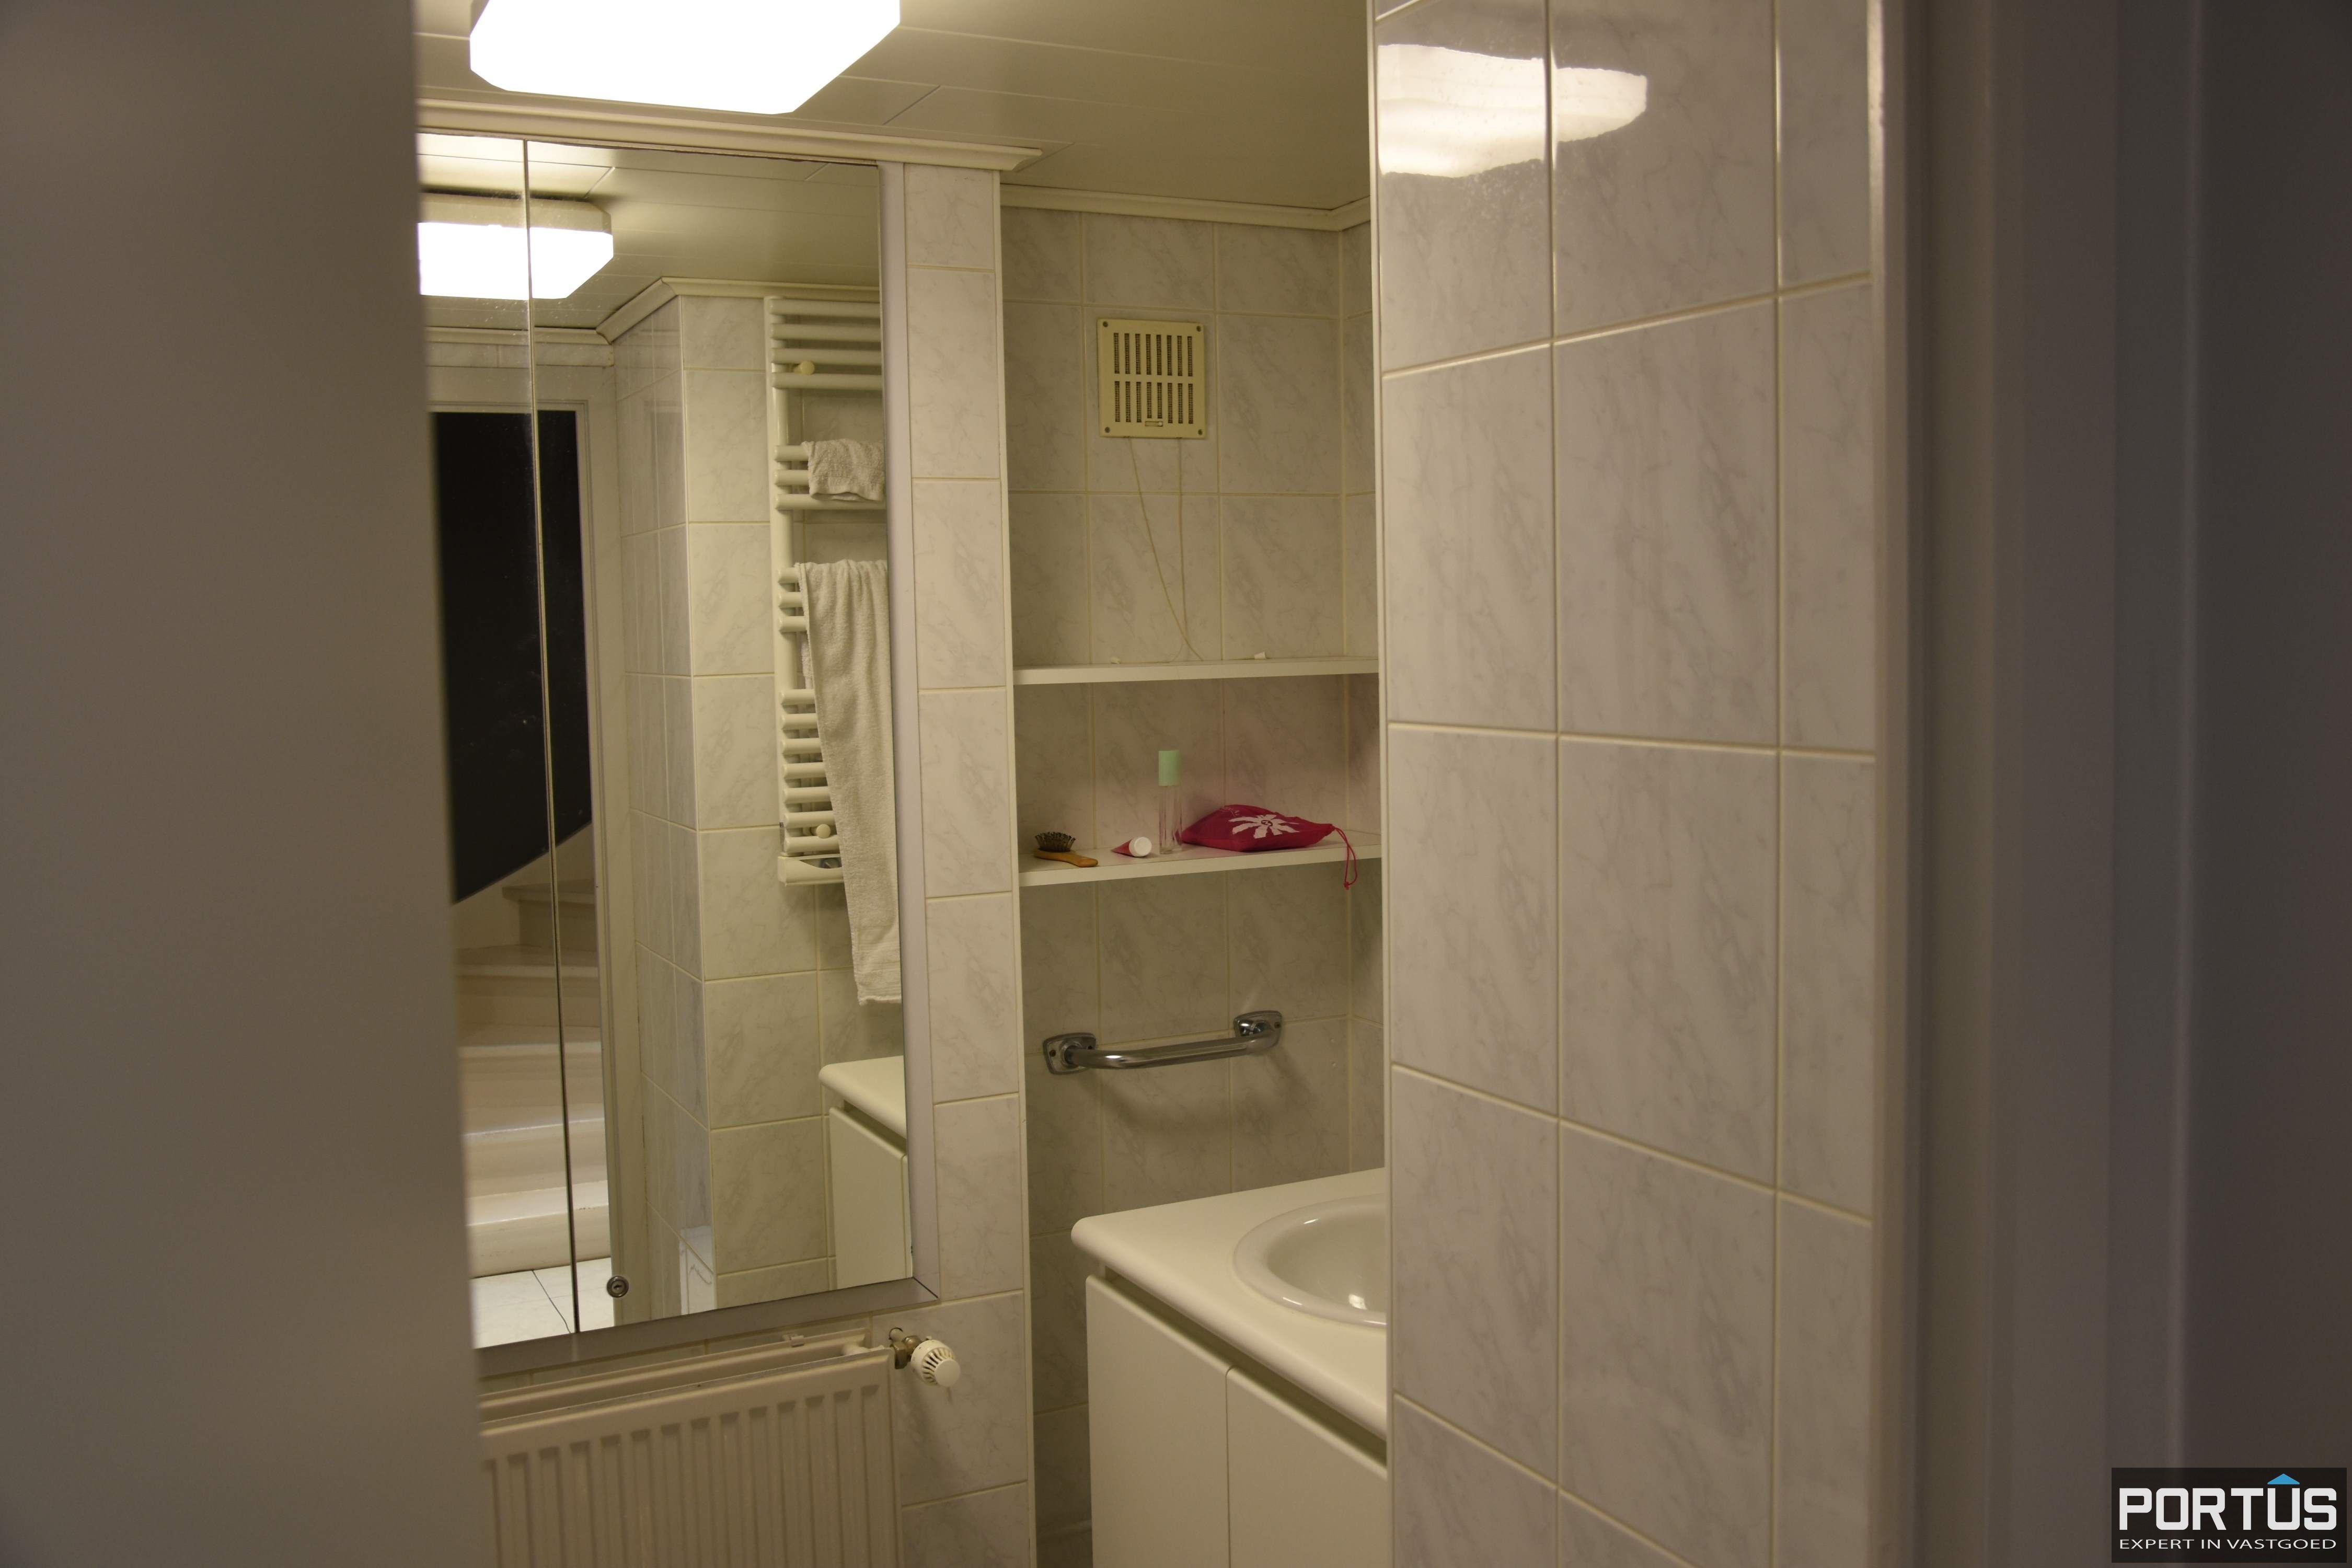 Instapklare woning met 2 slaapkamers - 8947